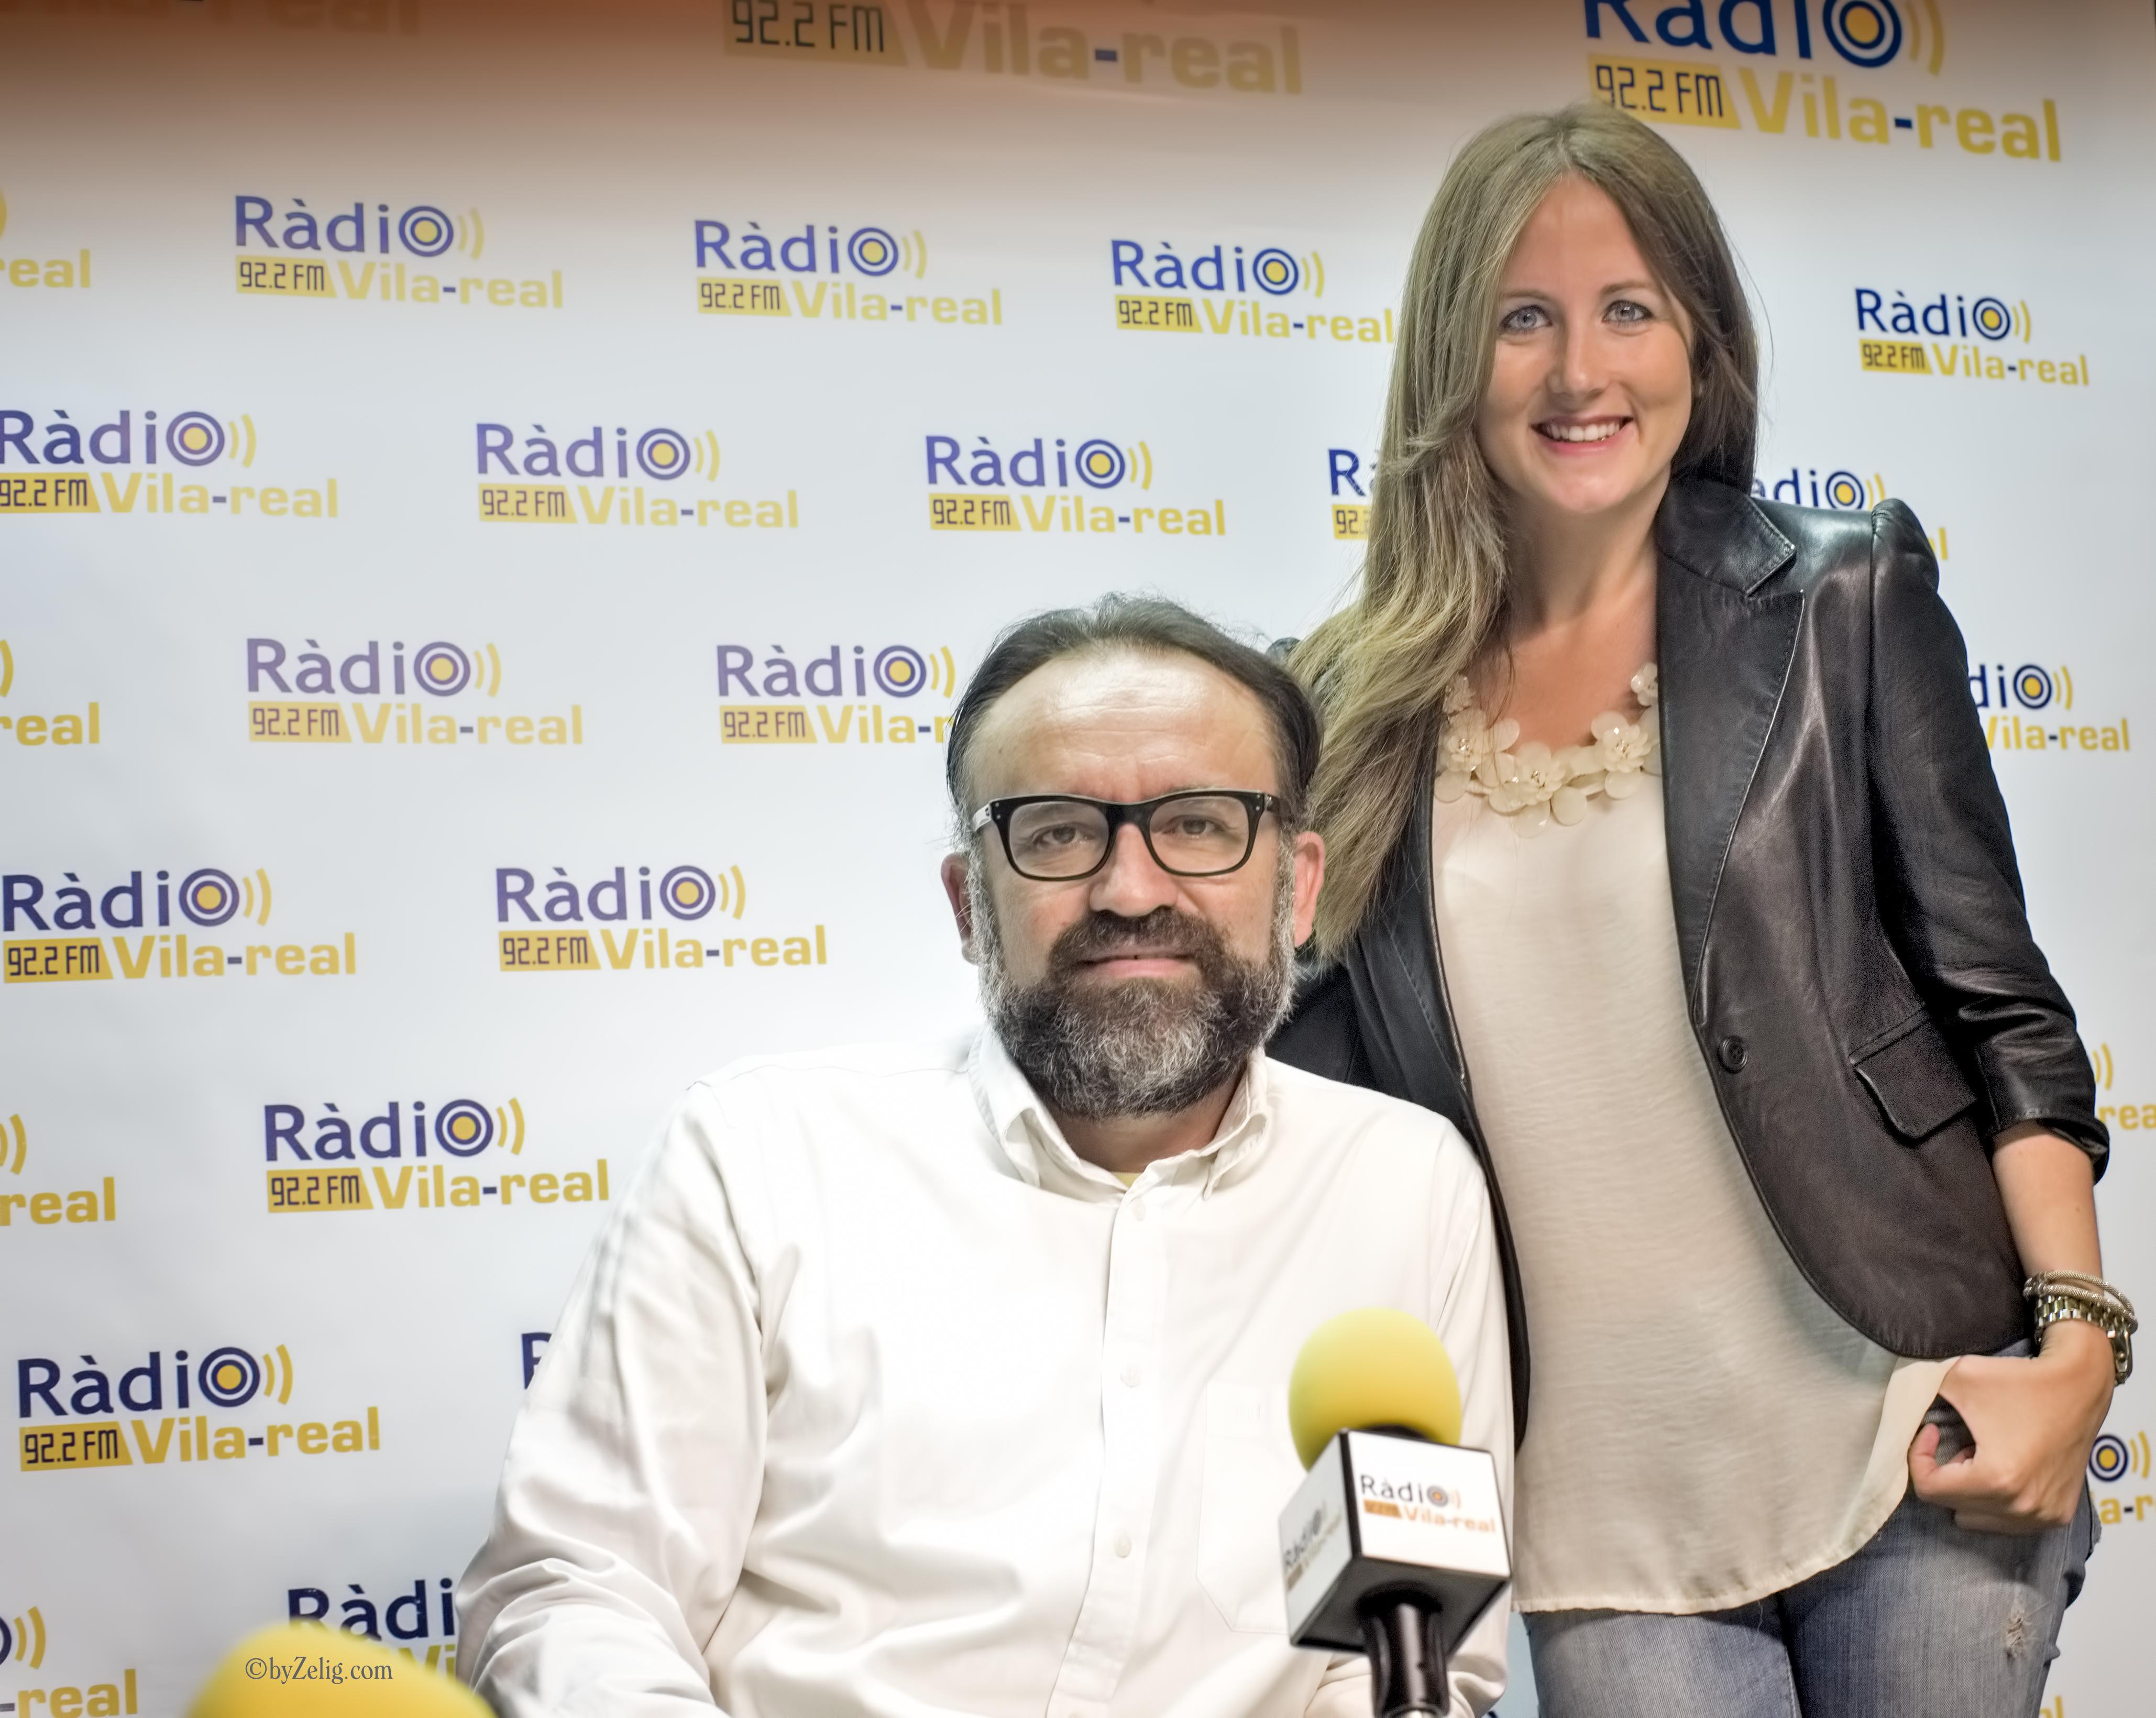 Esports Radio Vila-real. Programa del 22 de febrero de 2017